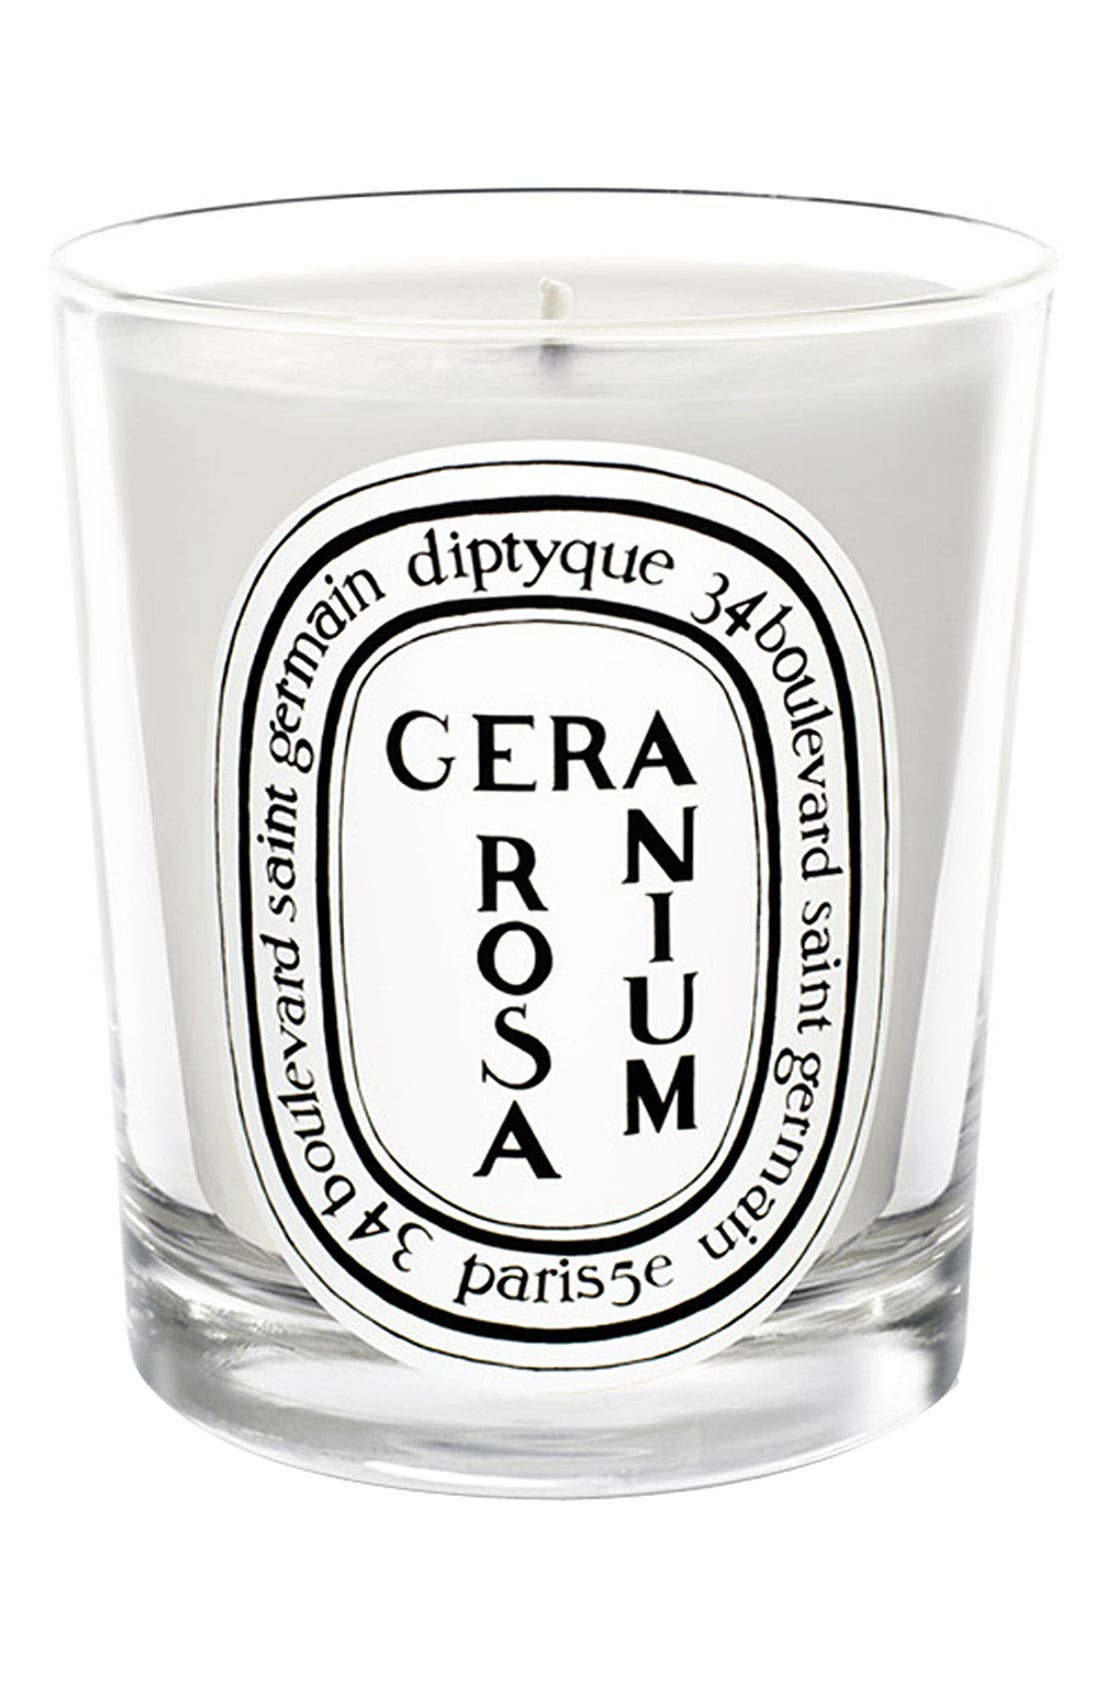 Geranium Rosa/Rose Geranium Scented Candle,                             Main thumbnail 1, color,                             NO COLOR